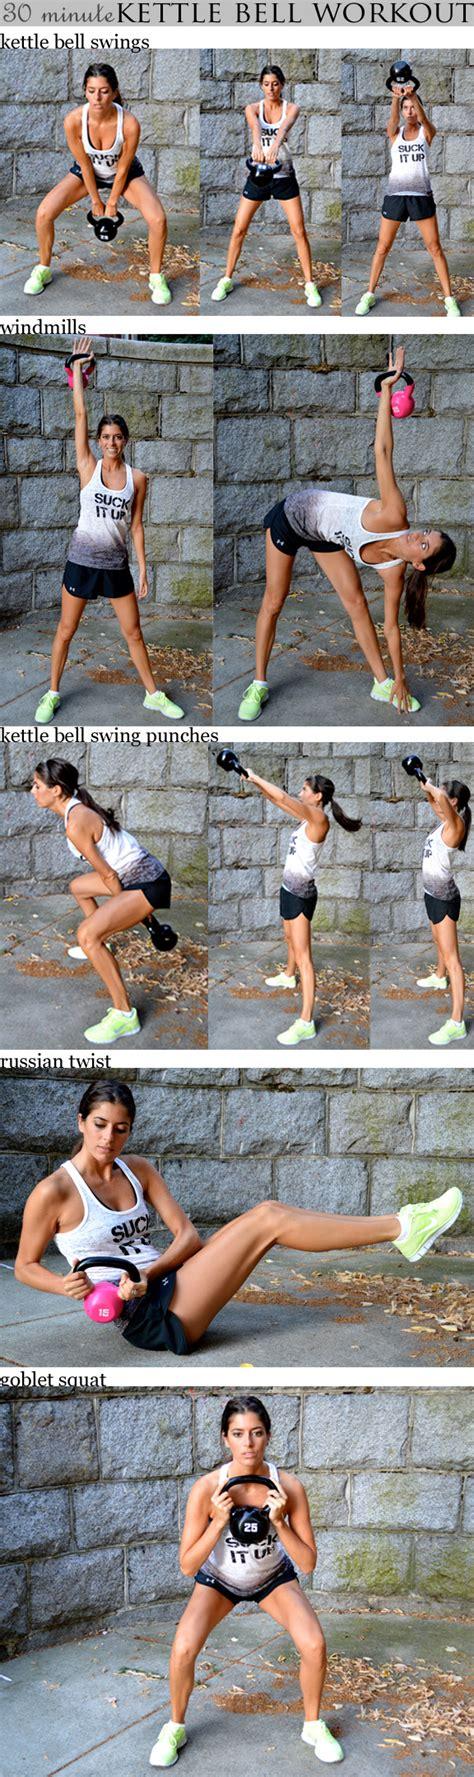 workout minute kettle bell kettlebell swings swing workouts russian kettlebells routine training fitness weight pumps iron loss